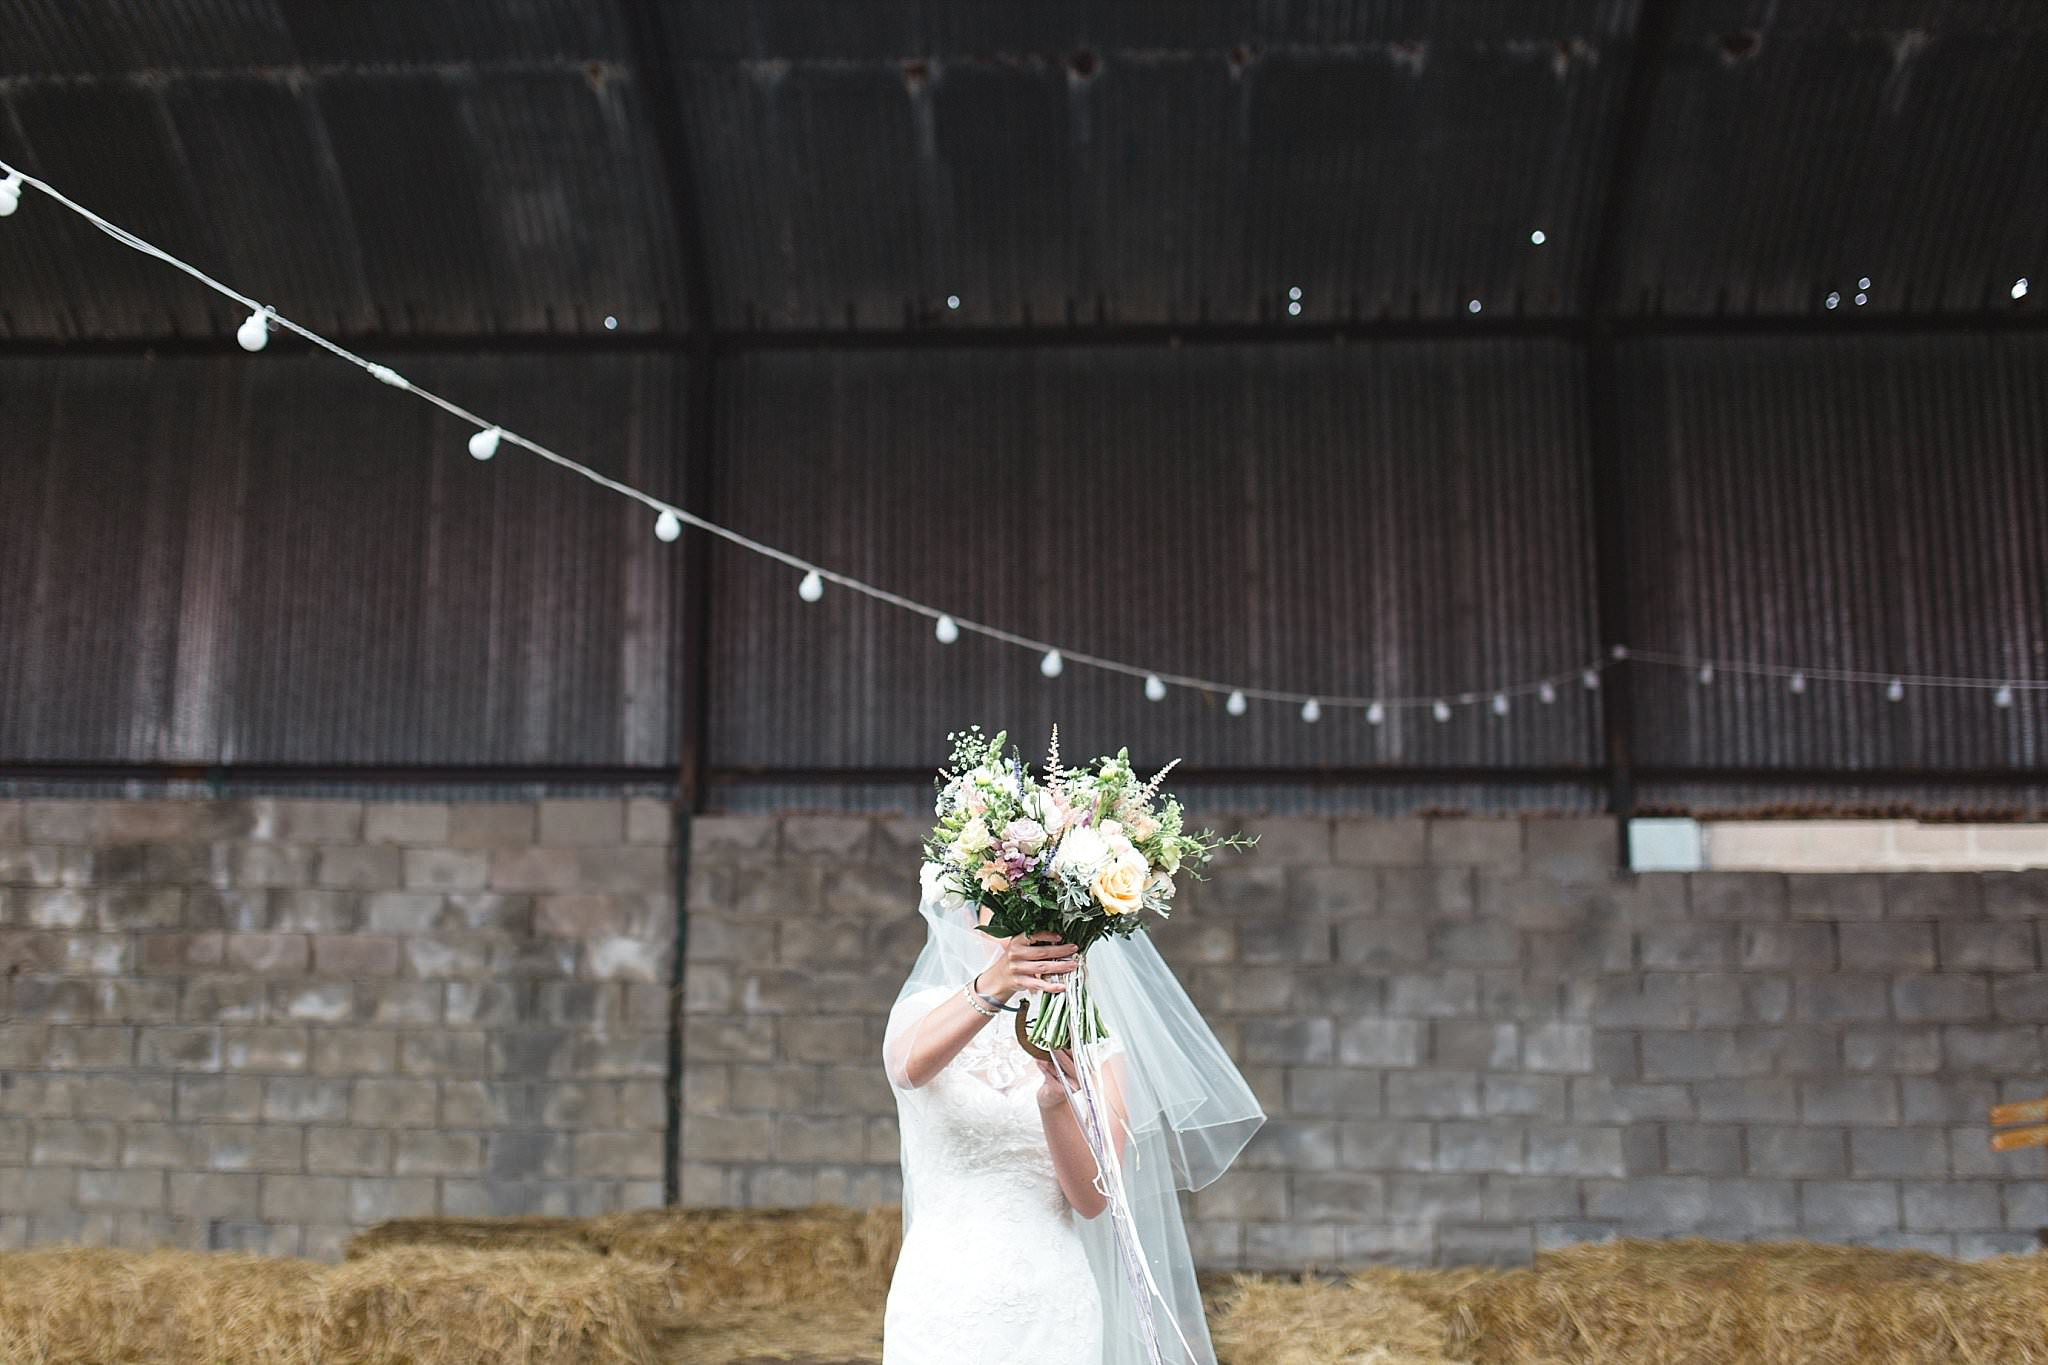 Fine Art Wedding Photographers Scotland,The Gibsons,barn wedding ayrshire,barn weddings scotland,dalduff farm wedding,glasgow wedding photographe: glasgow wedding photographers,natural wedding photographers,romantic photographers Scotland,